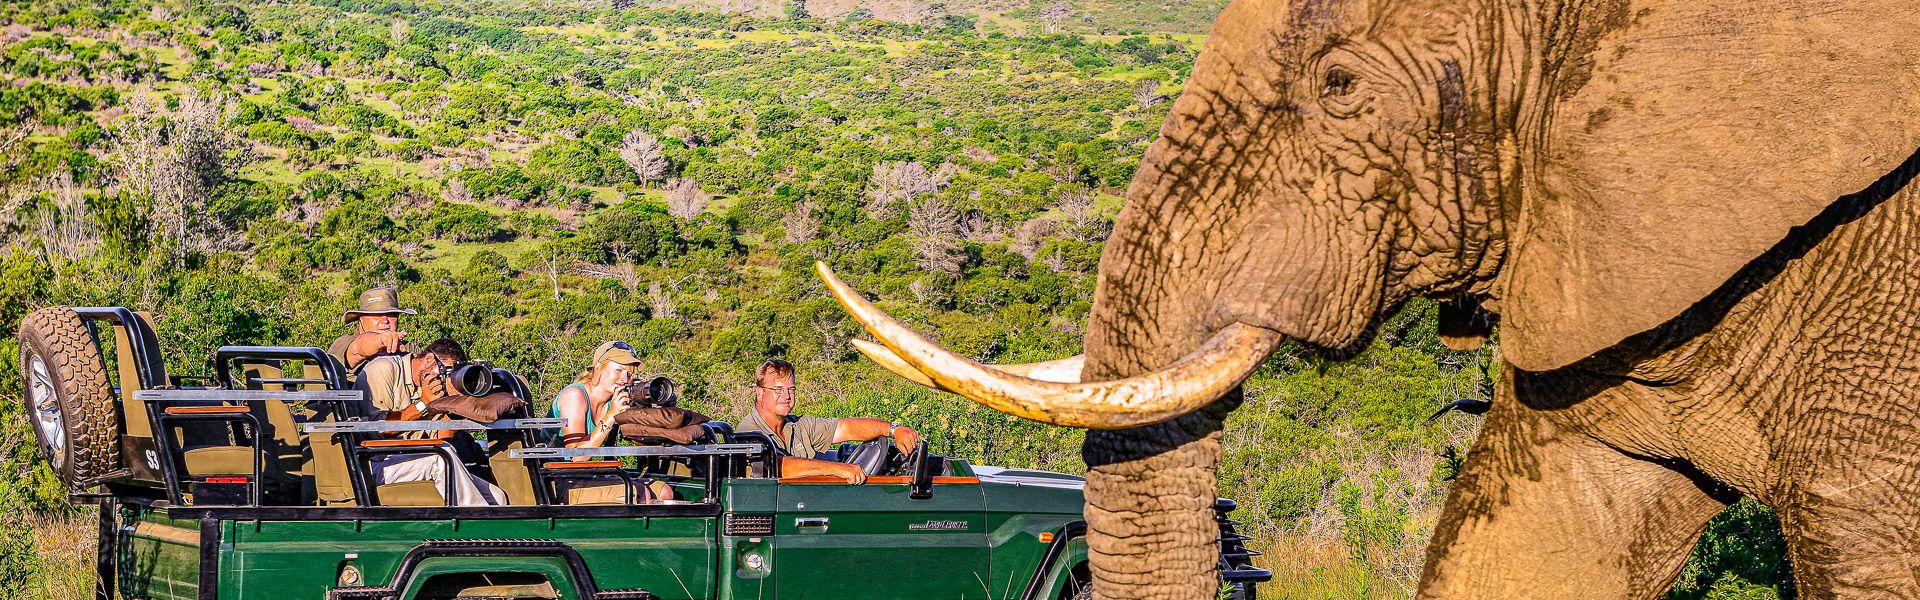 Südafrika und Eswatini Krüger Afrika Erlebnis-Reisen